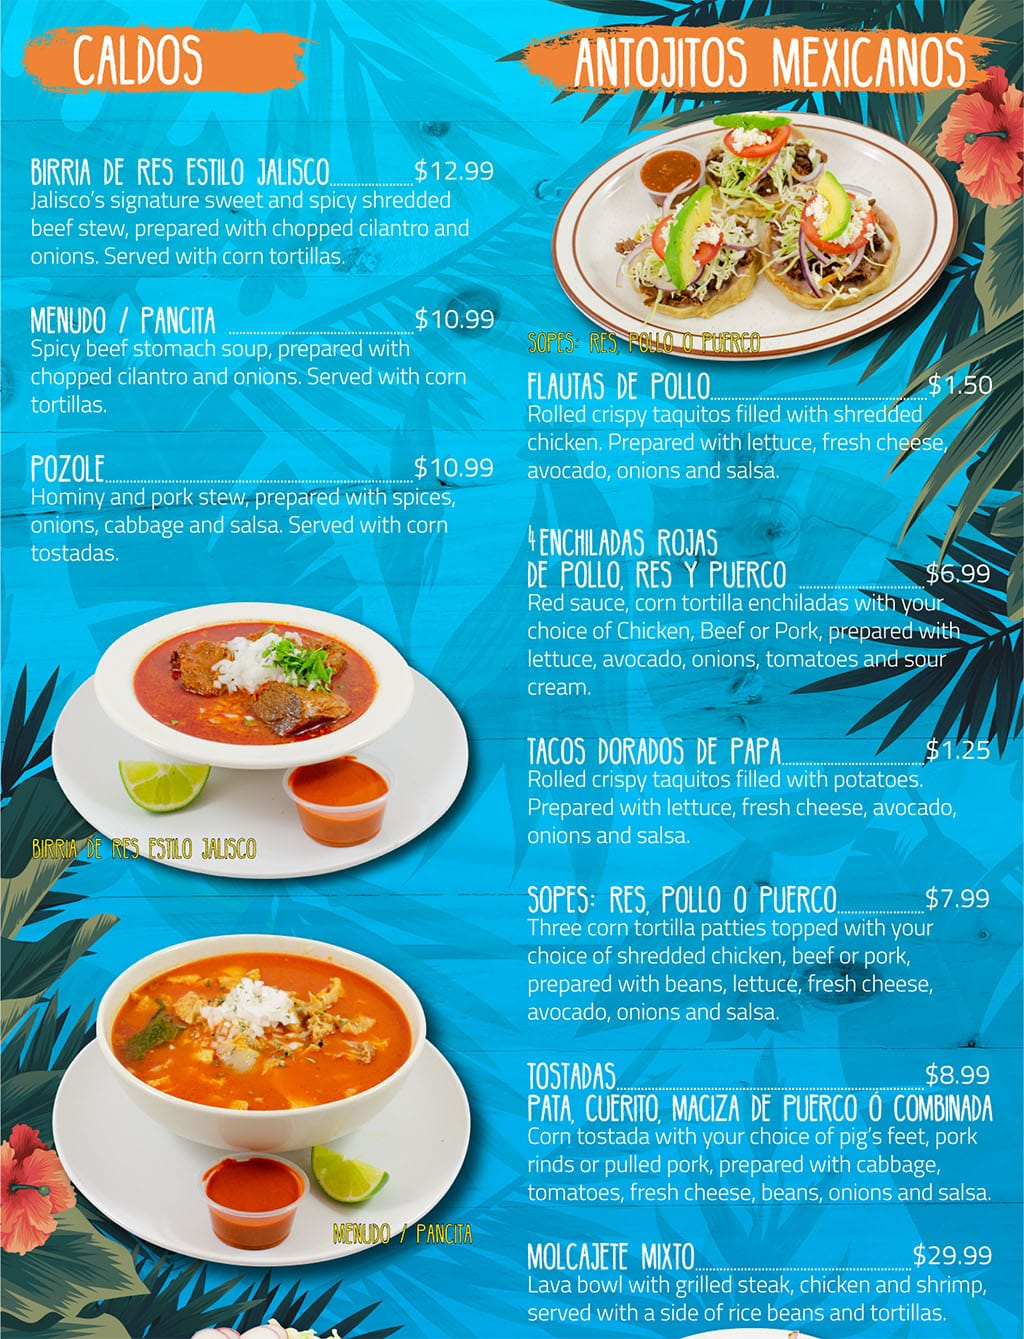 Puerto Vallarta Mexican Grill menu - caldos, antojitos mexicanos